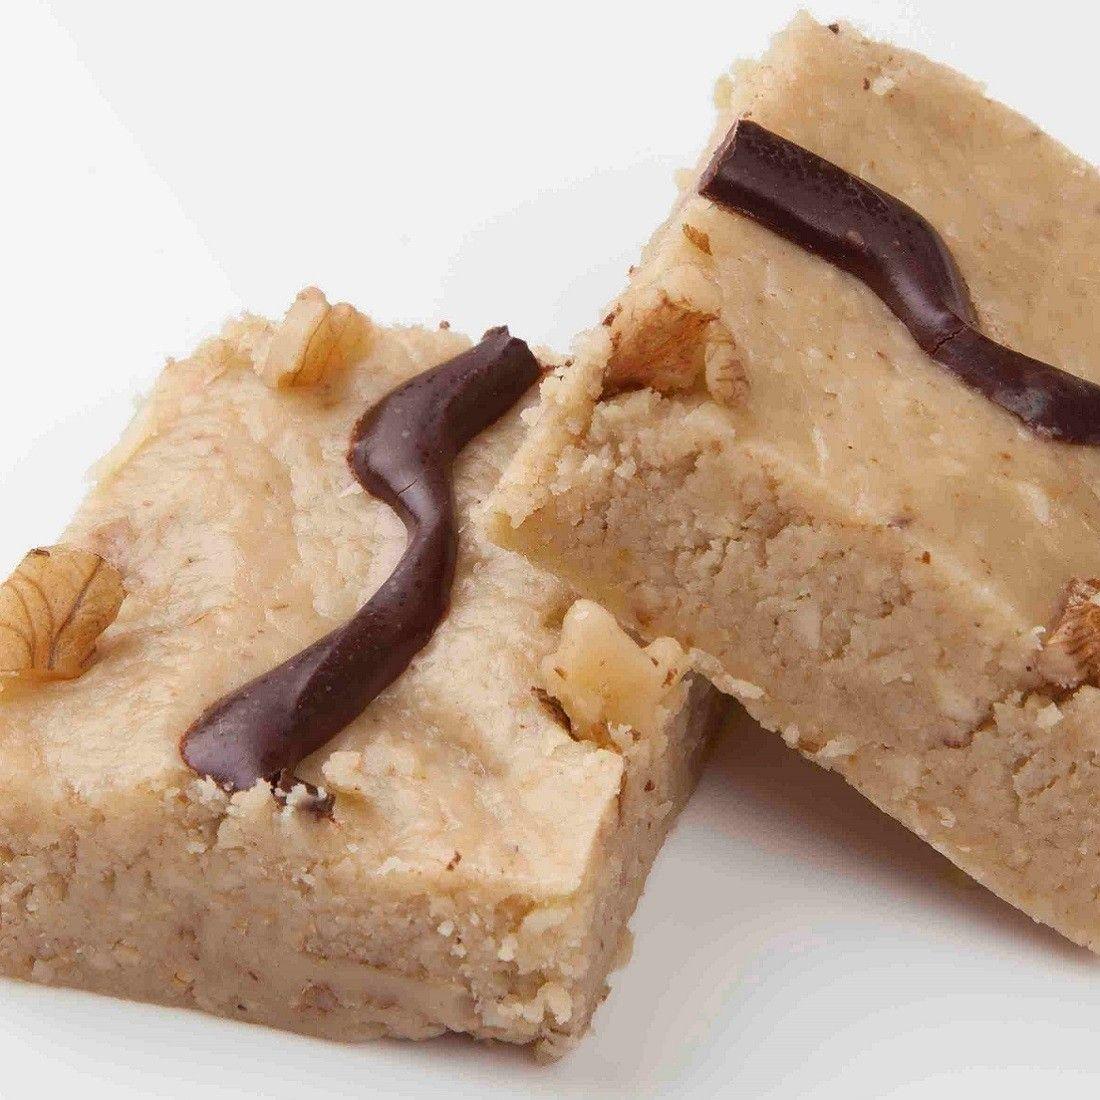 Classic homemade walnut fudge from ooty chocolate